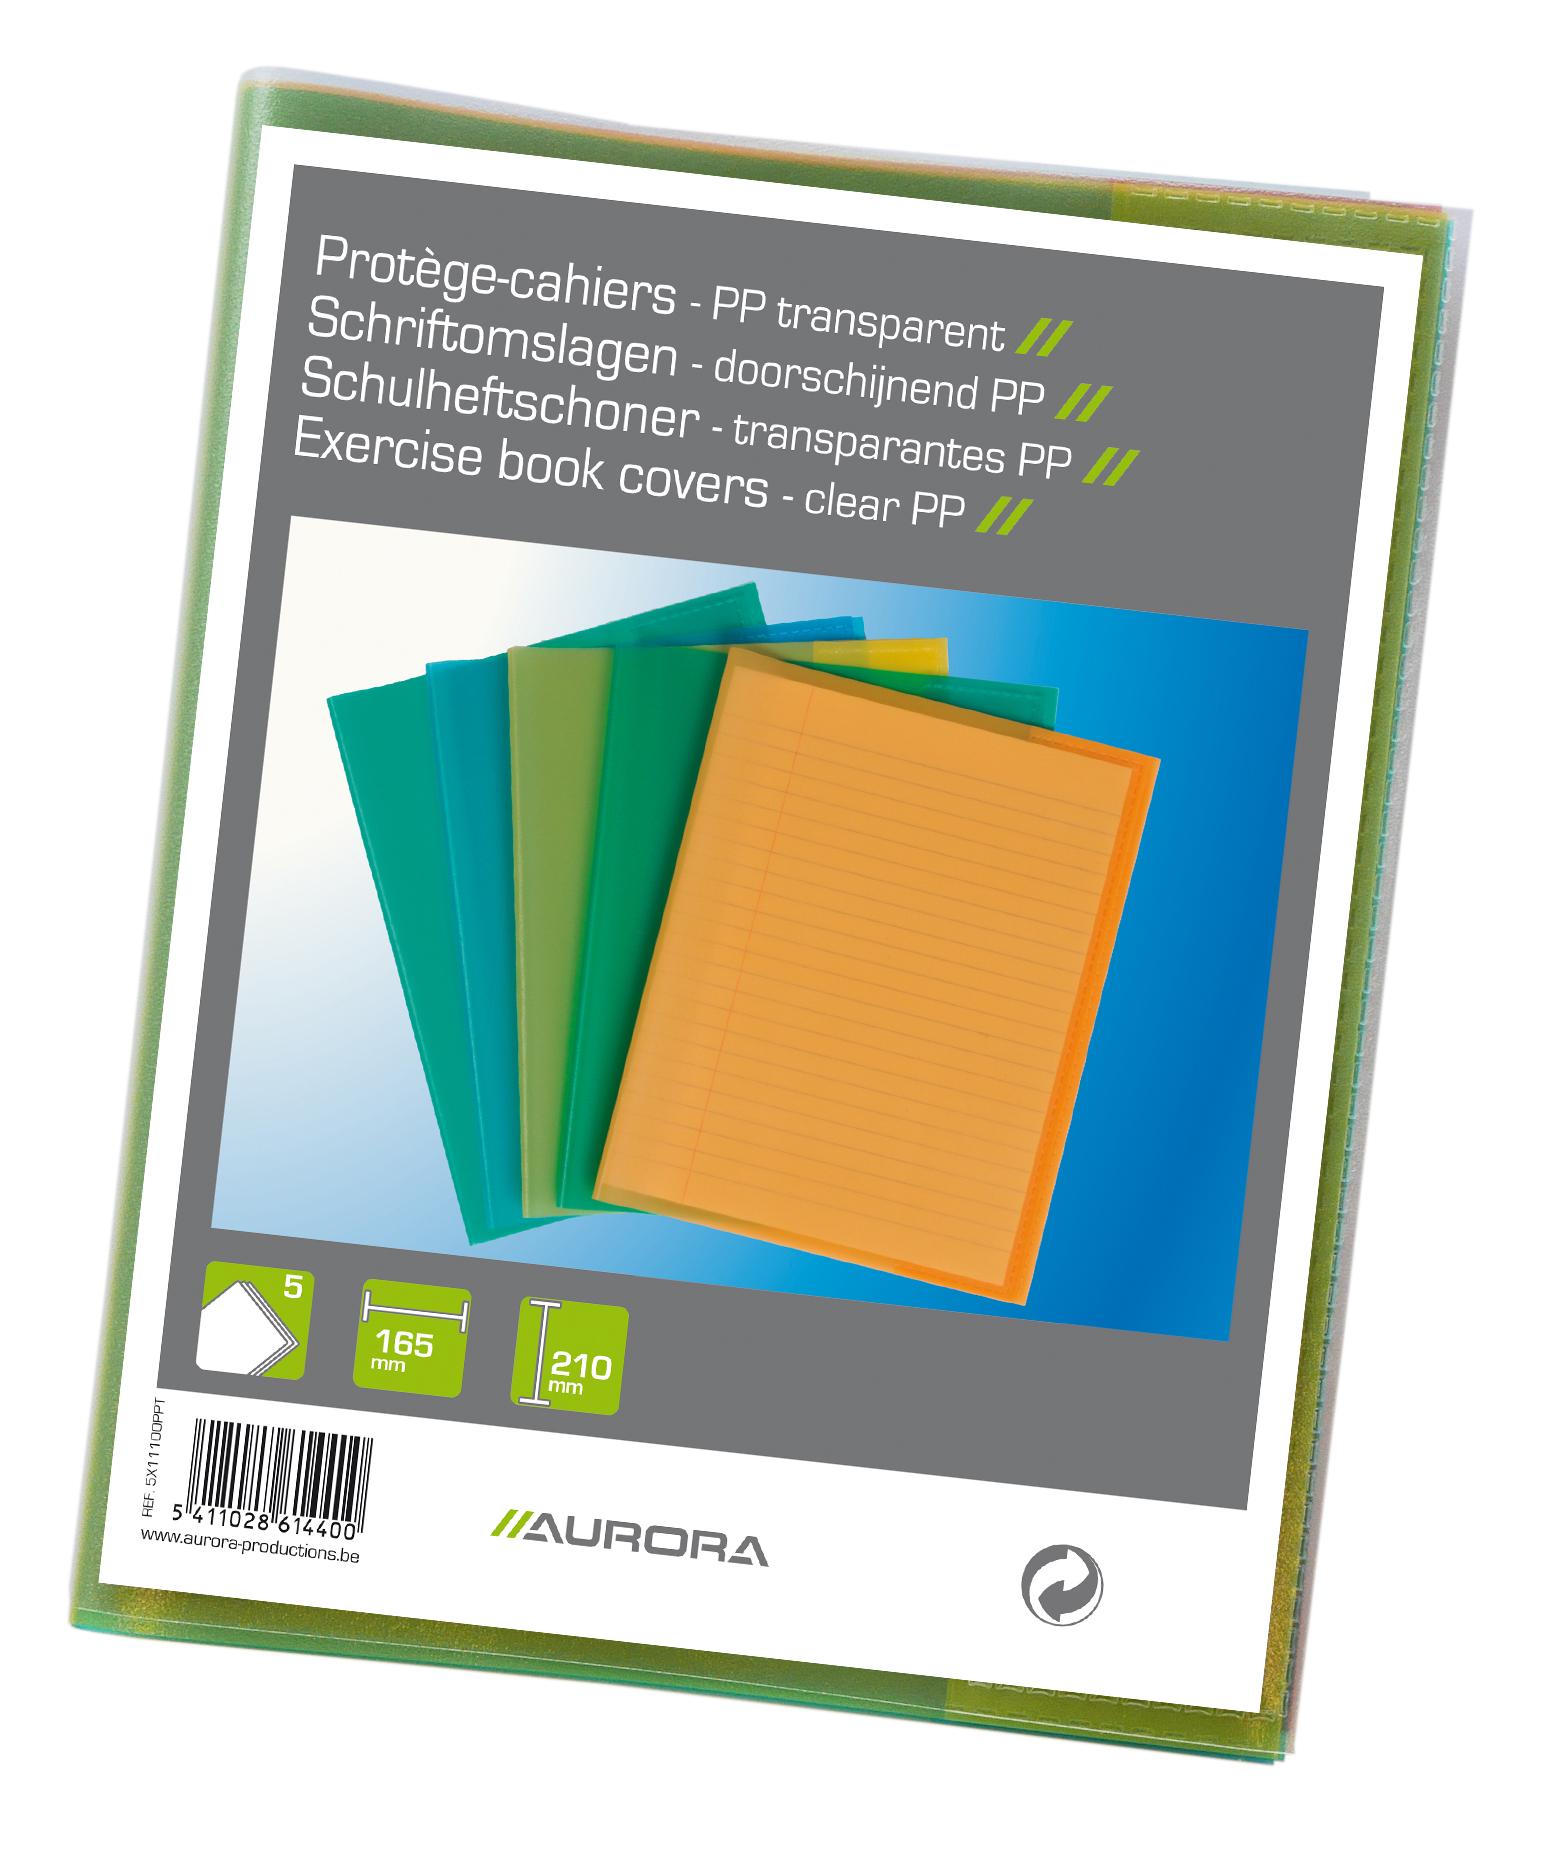 Coperta pentru caiet A5, PP - 120 microni,  5 buc/set, Aurora - transparent color asortate